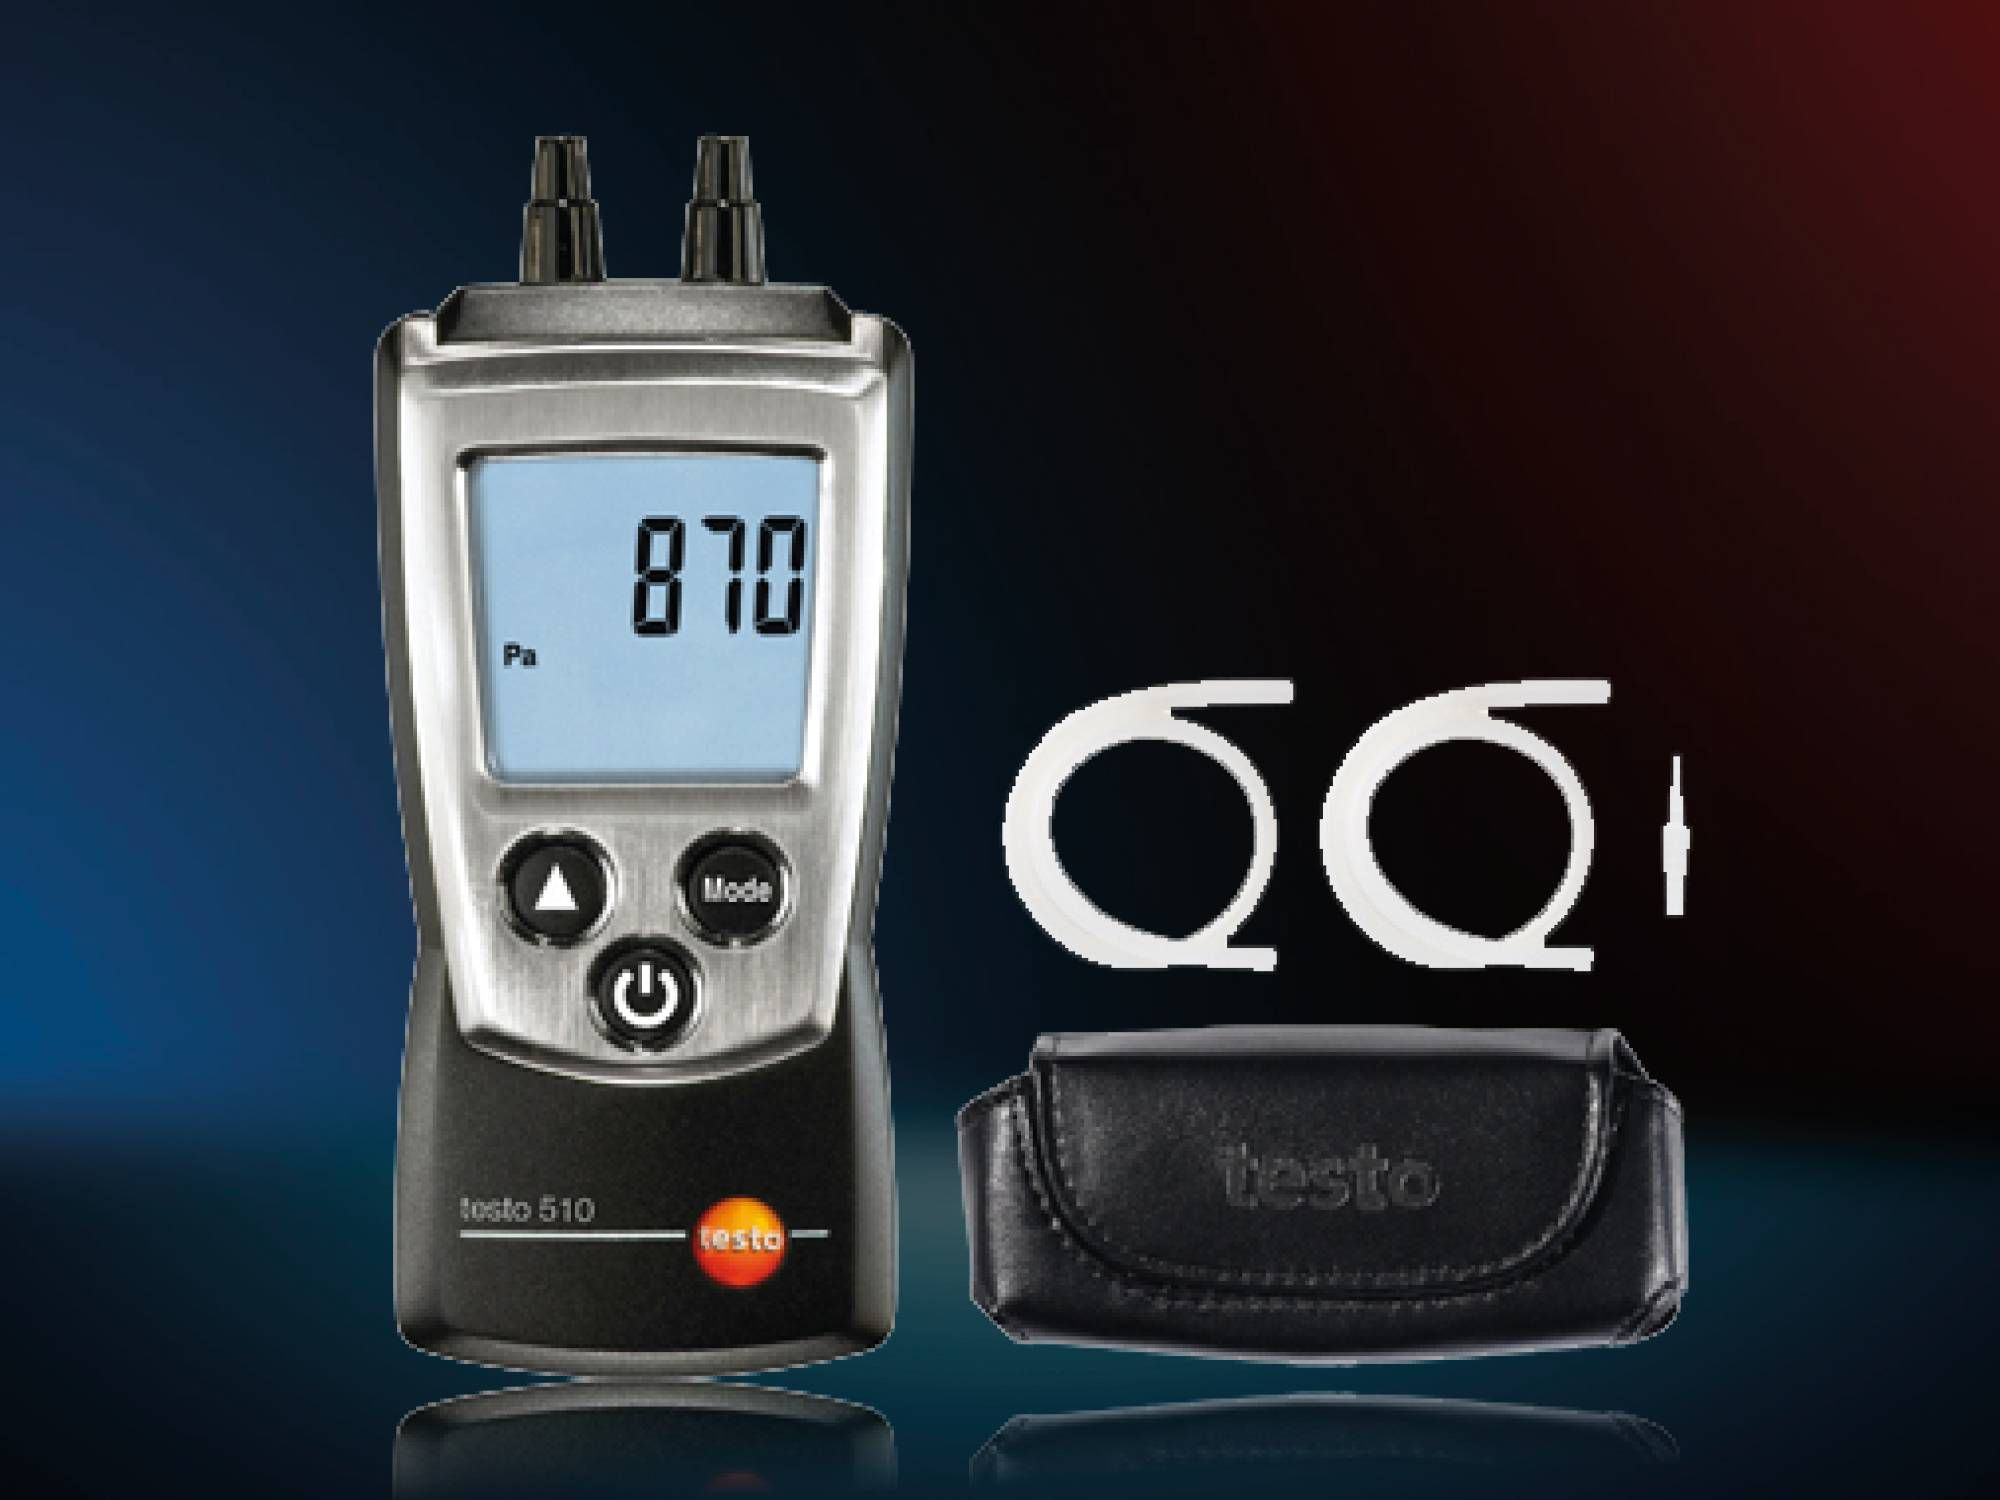 Set de presión diferencial testo 510